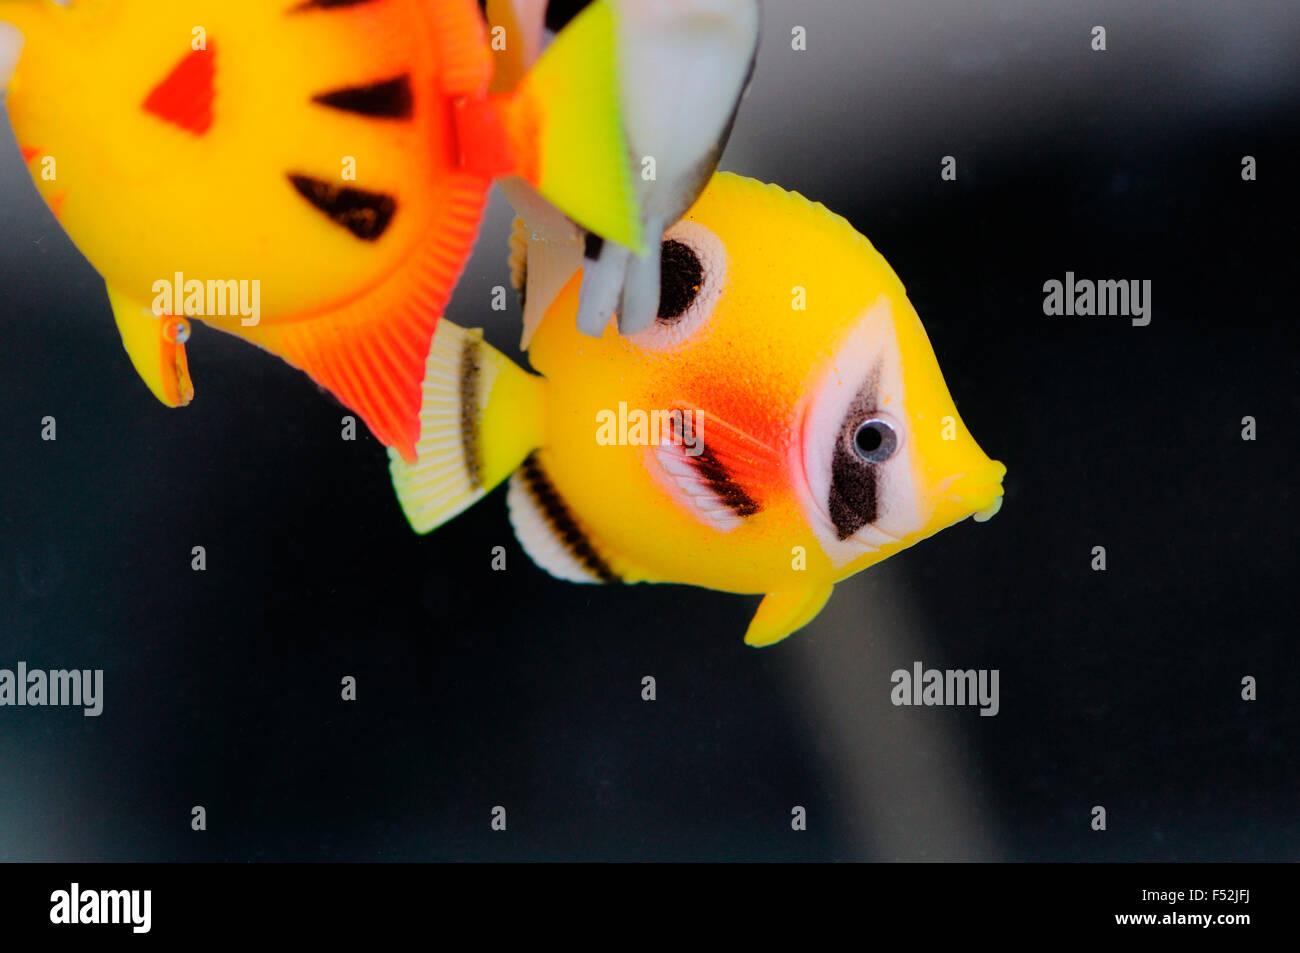 Plastic Fish Stock Photos & Plastic Fish Stock Images - Alamy